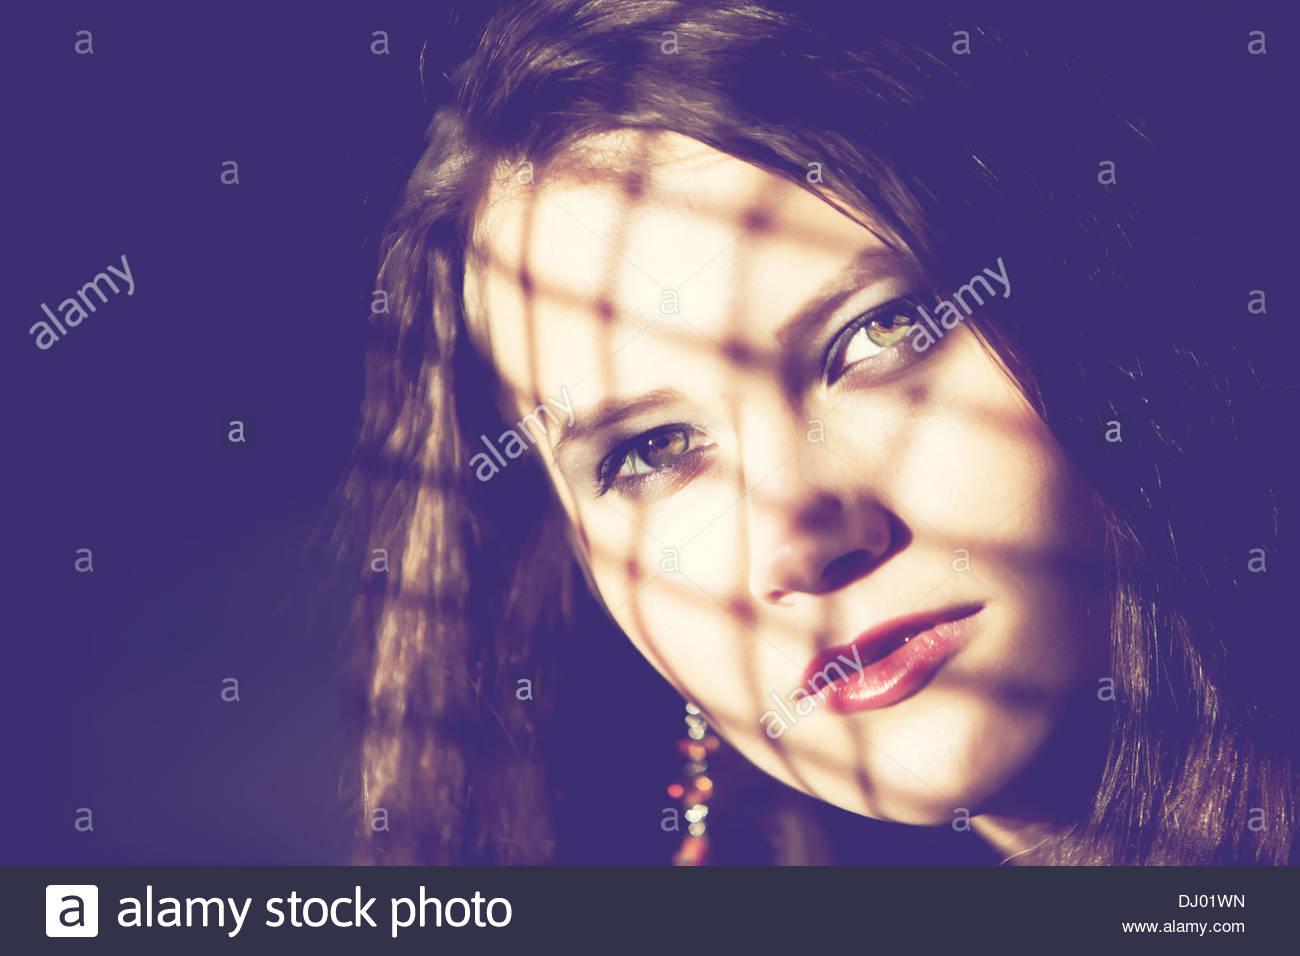 Woman lit by sun shining through a mesh - Stock Image